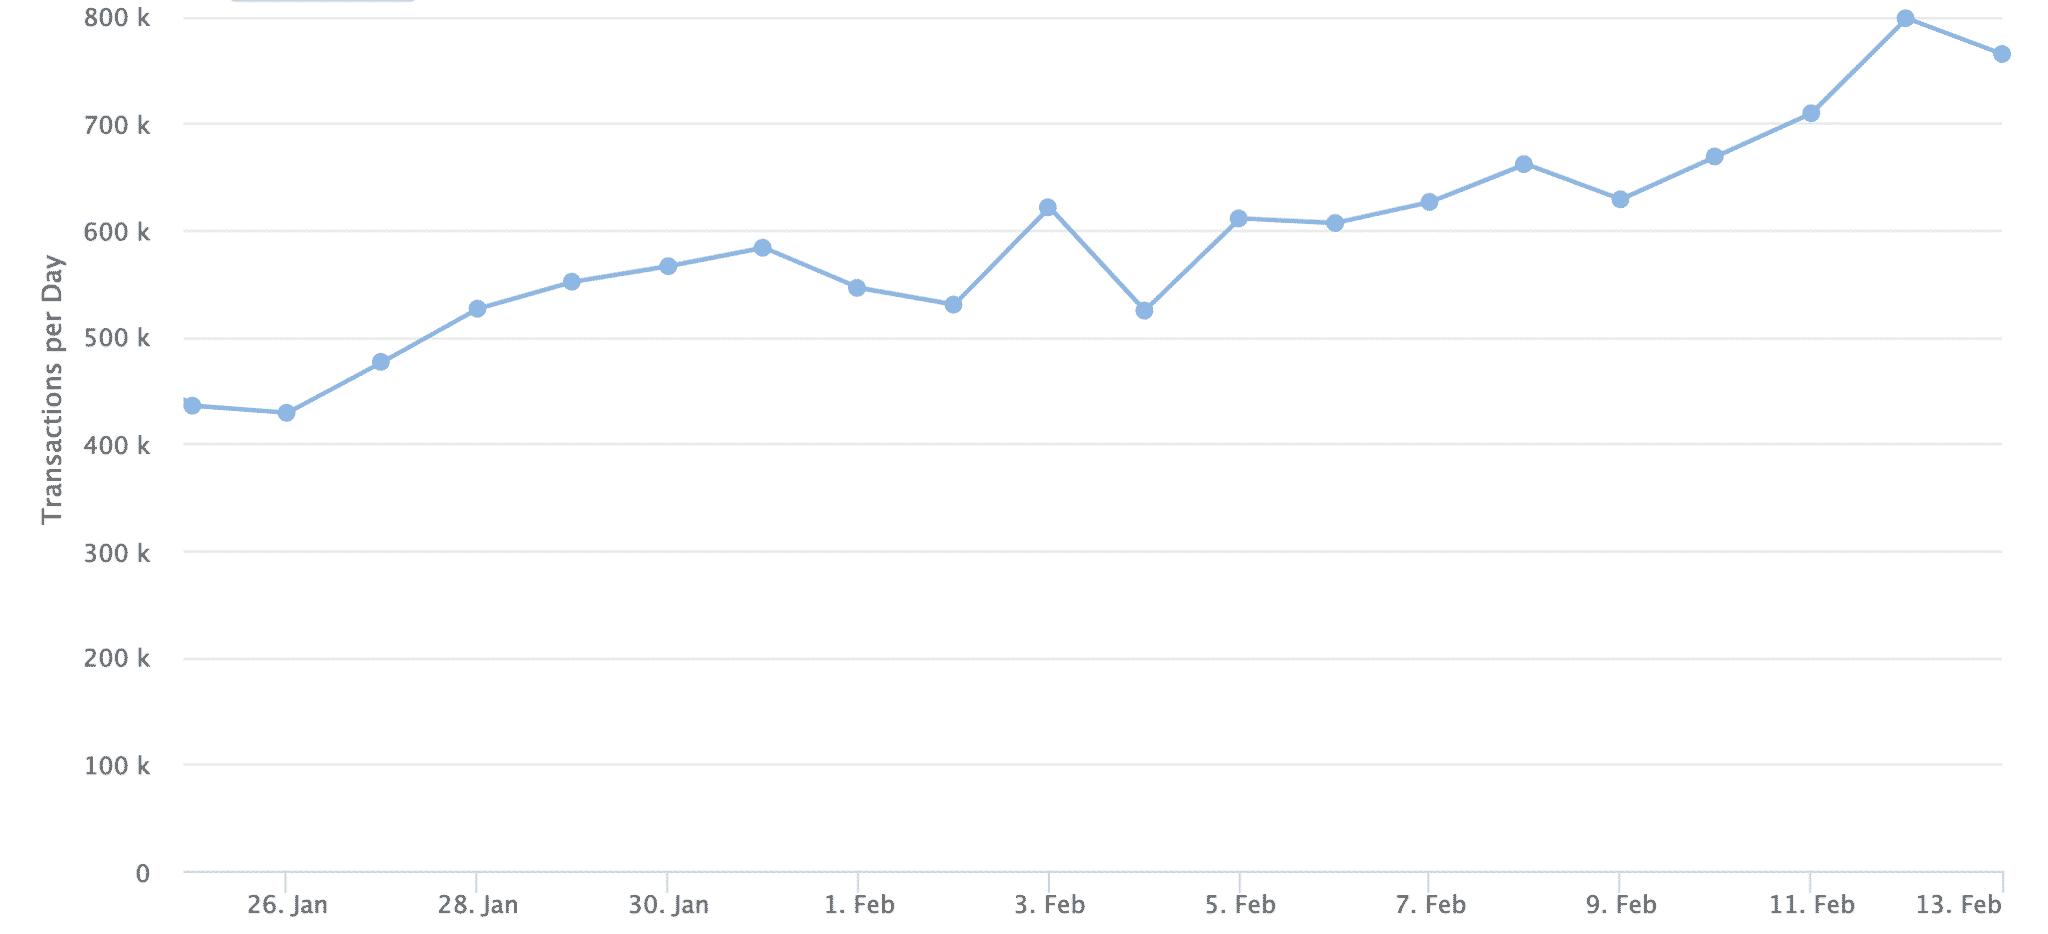 Ethereum transactions double, Feb 2020